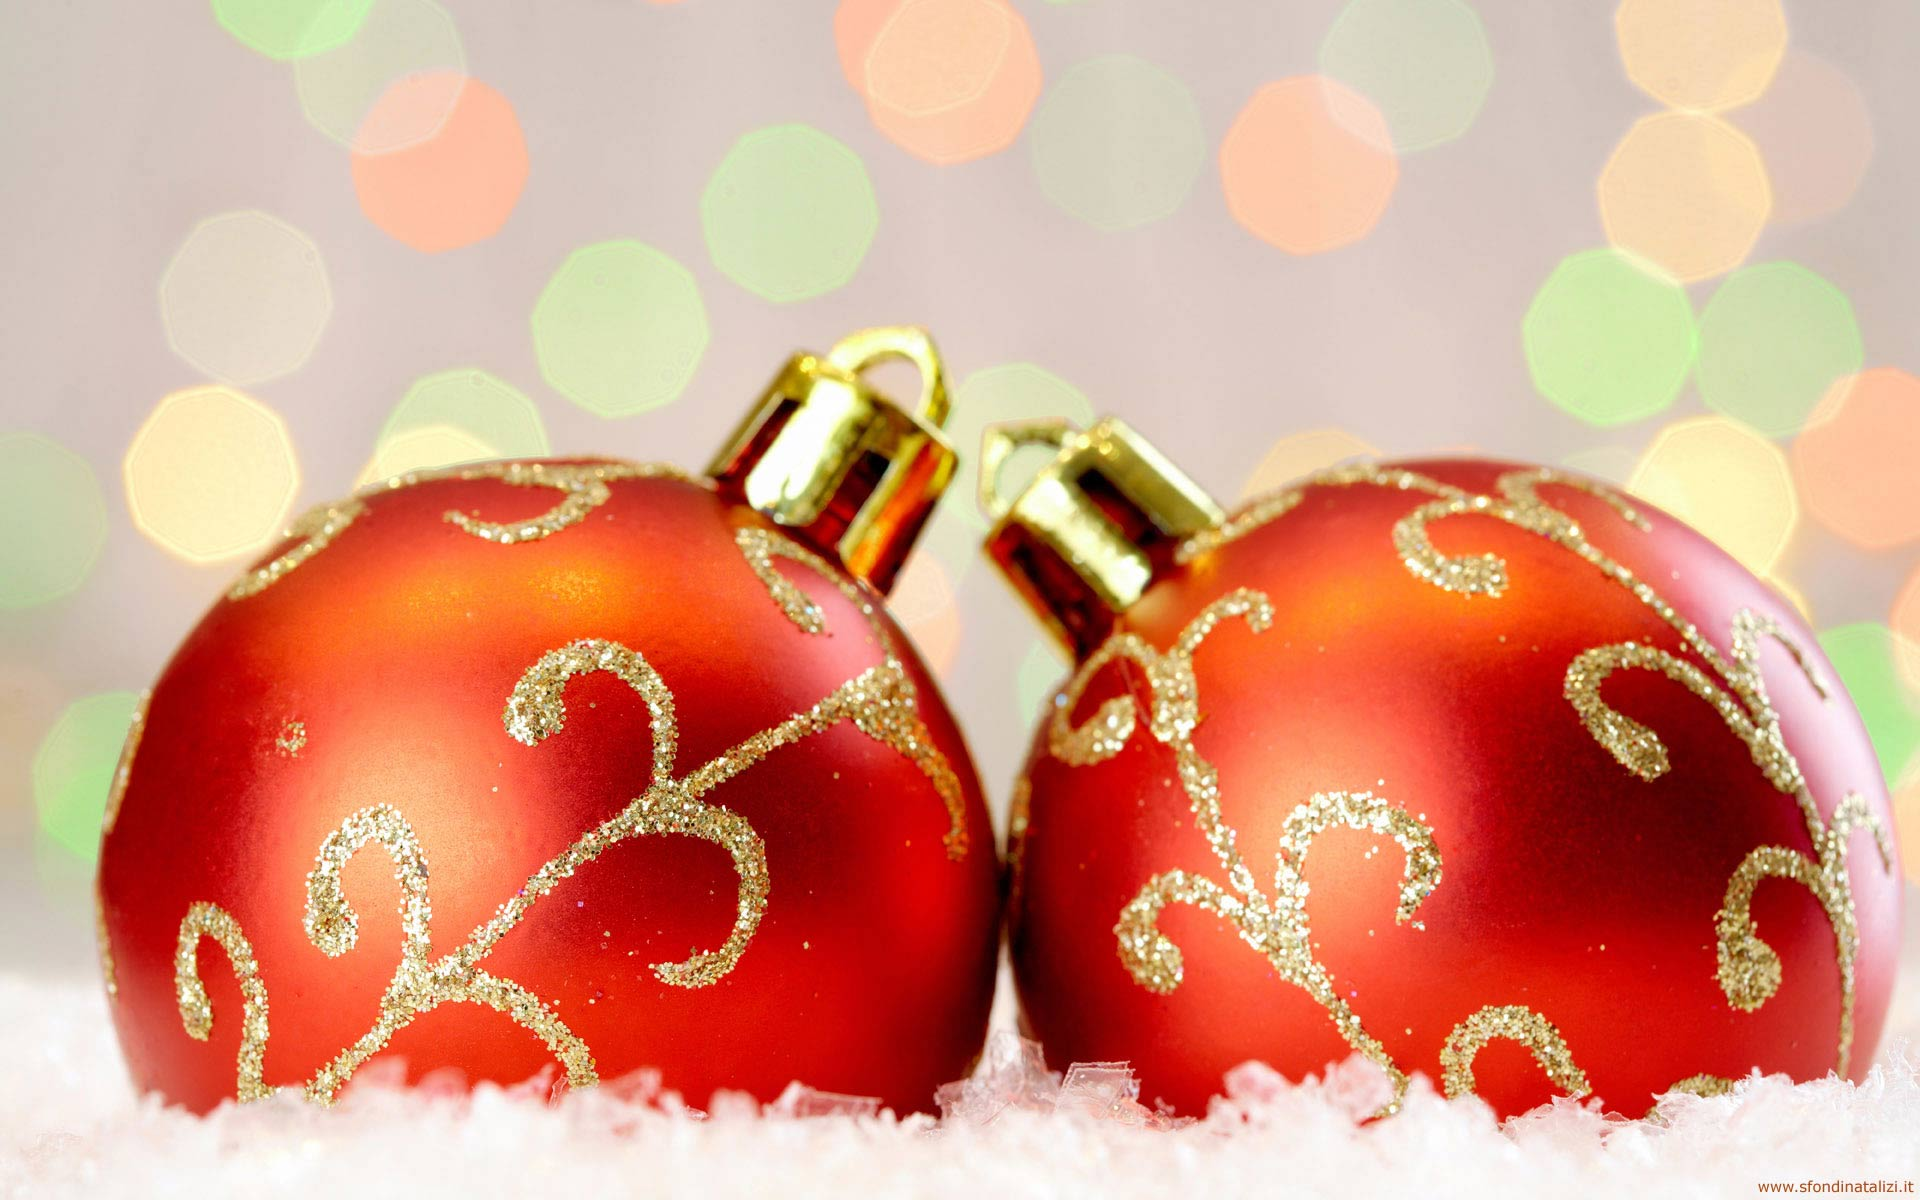 Sfondo Natalizio - Sfondo natalizio palline